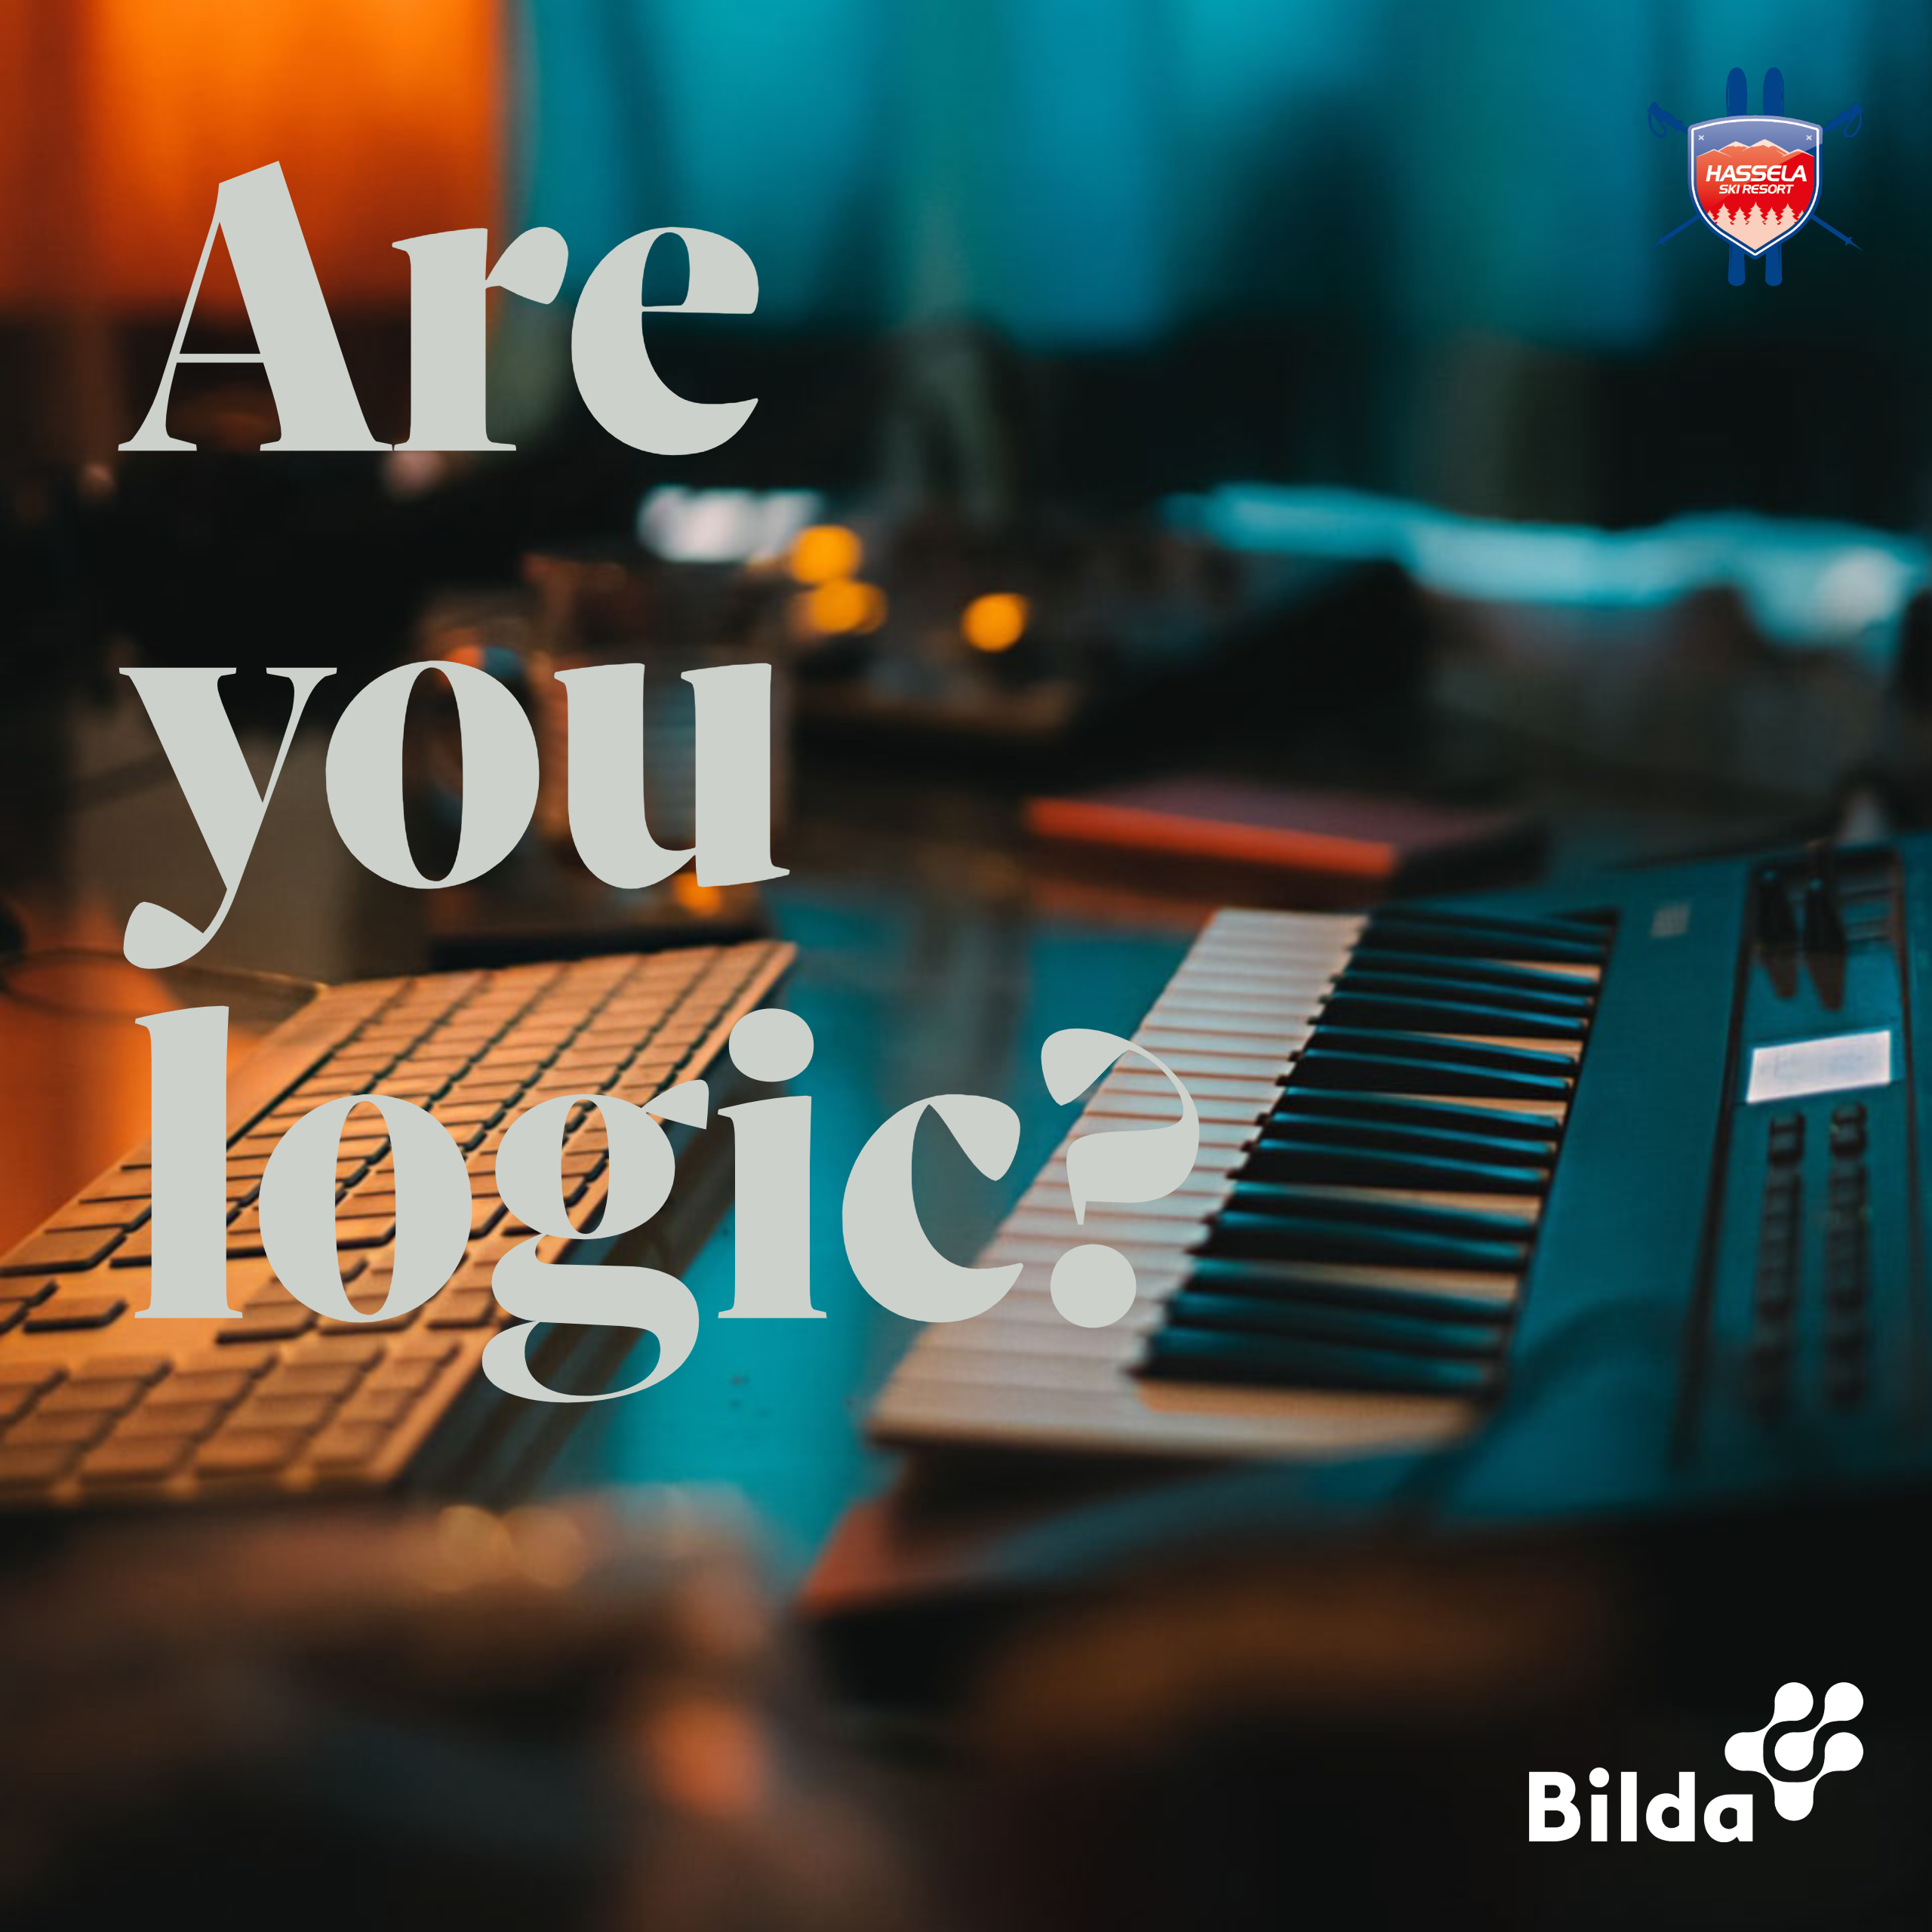 Are you logic?